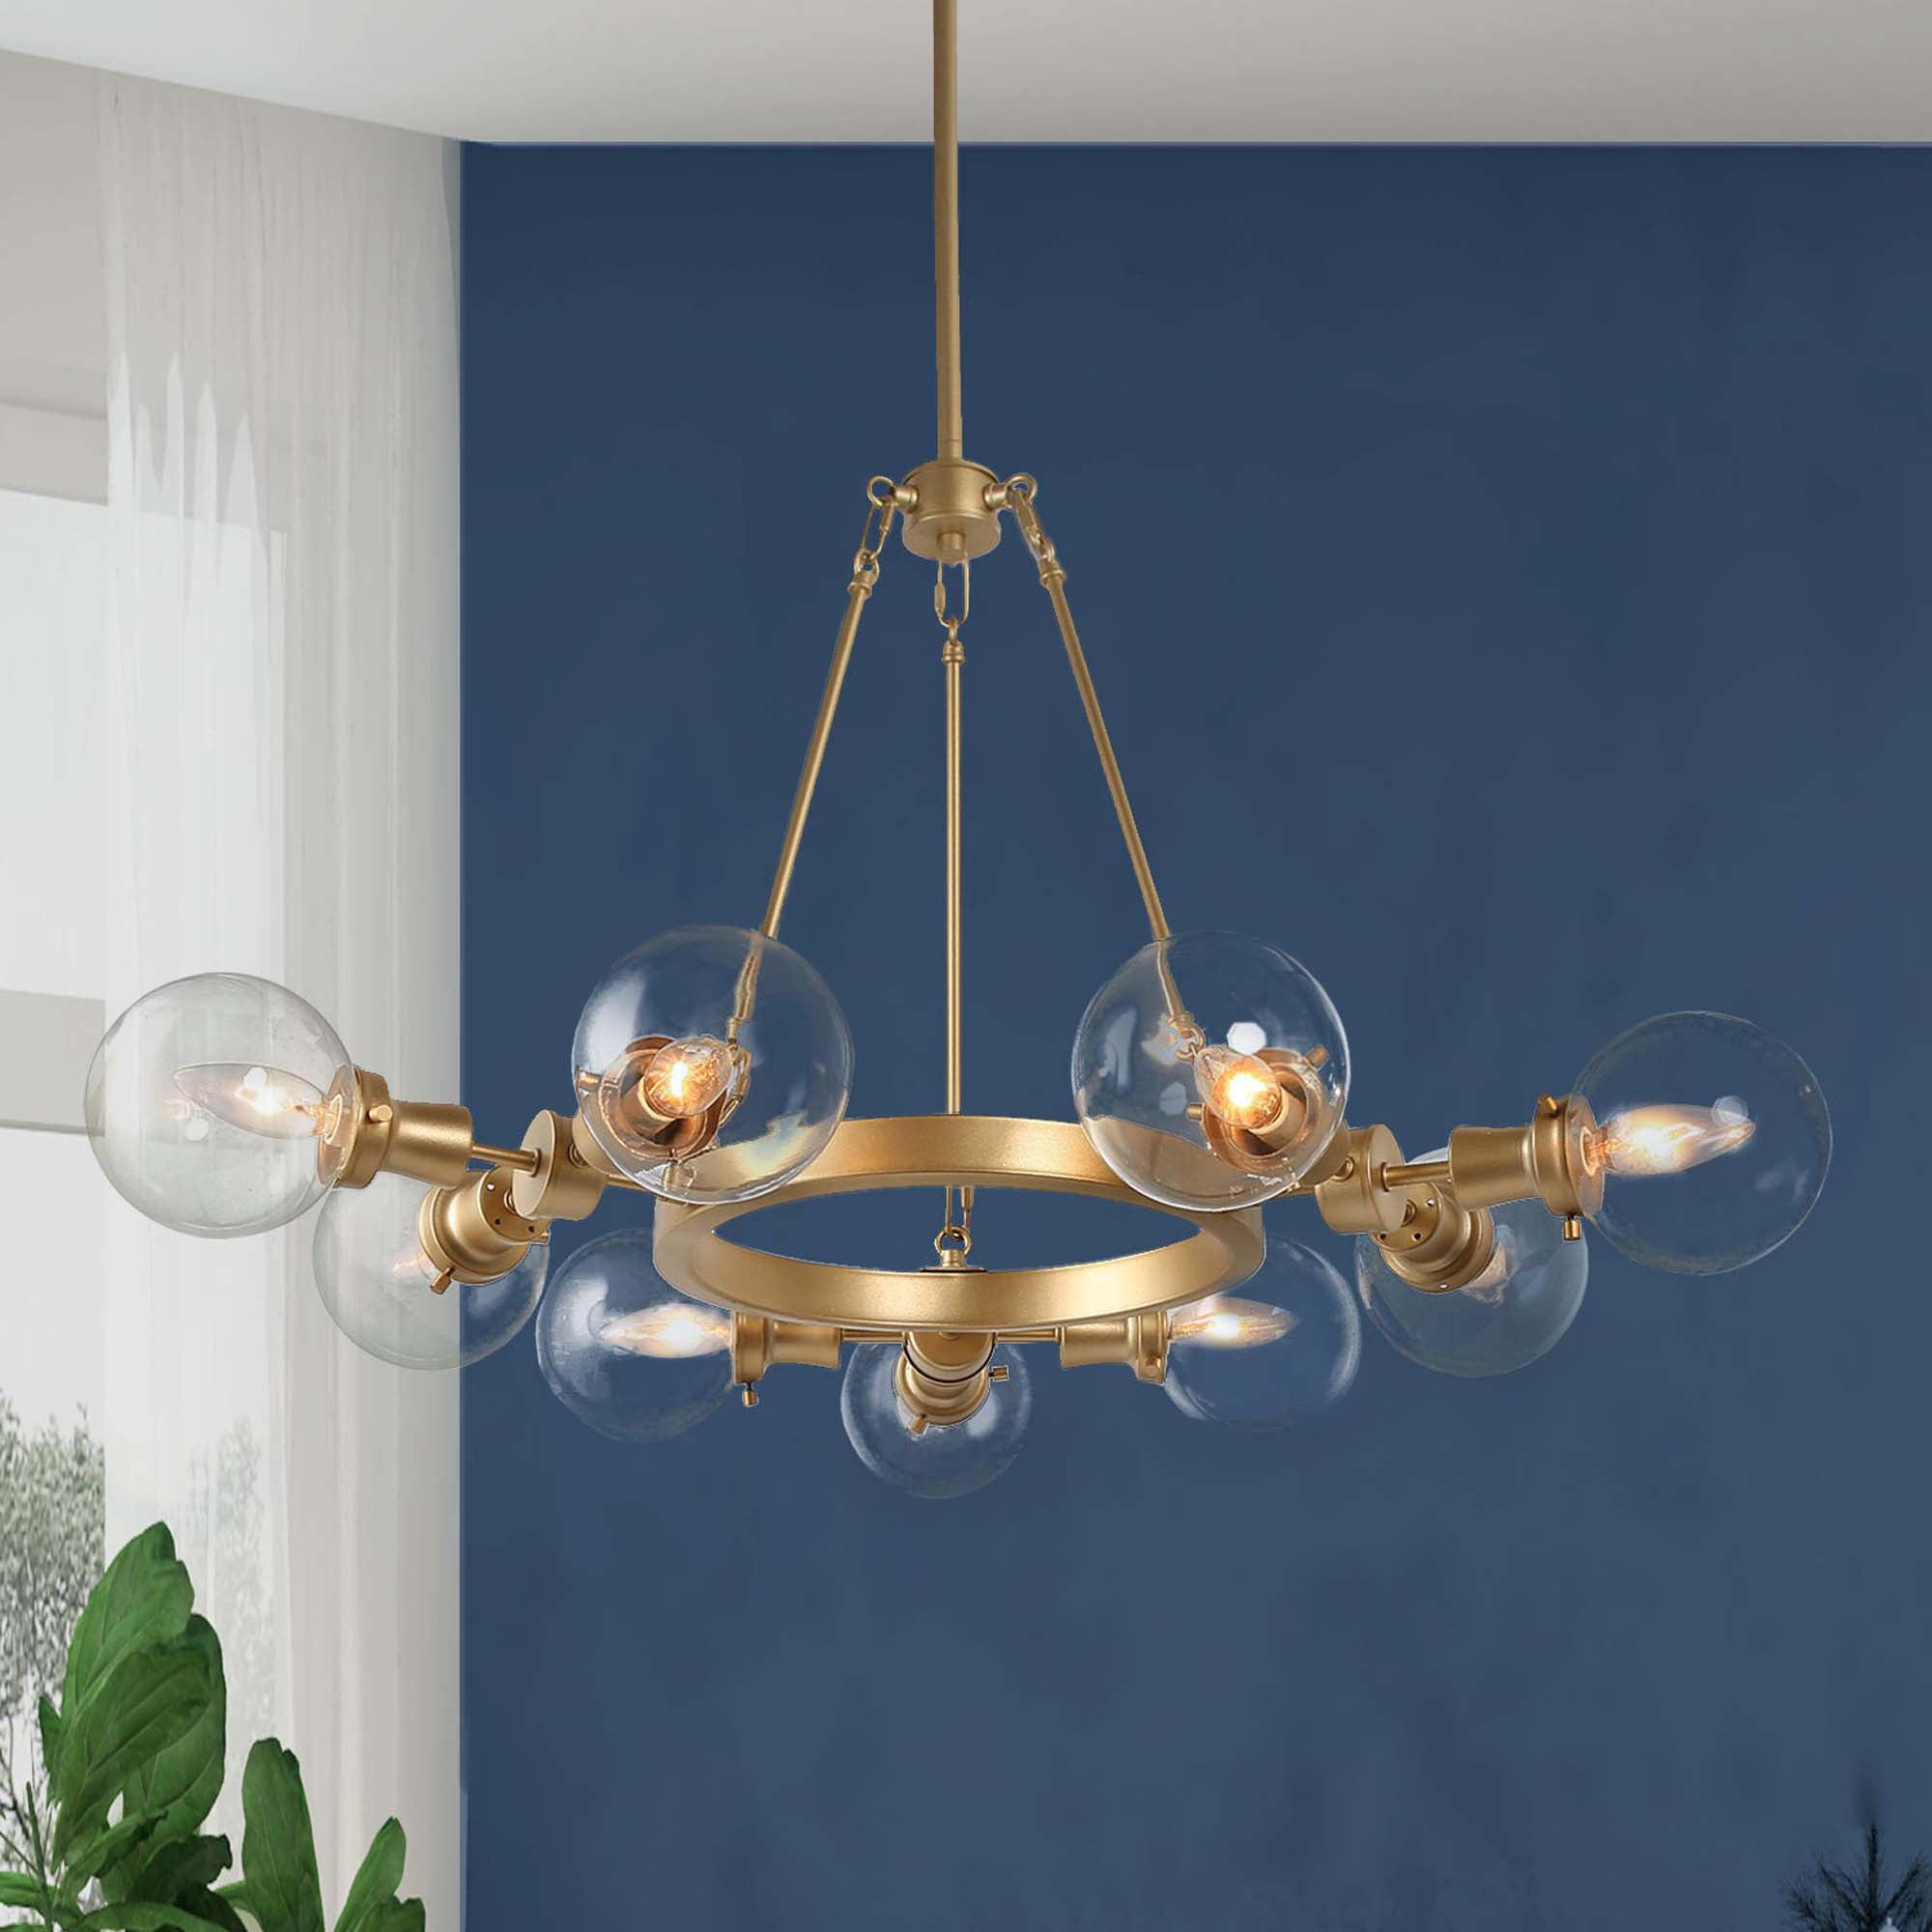 Glam 9 Light Gold Wagon Wheel Chandelier With Glass Globe Shades Walmart Com Walmart Com